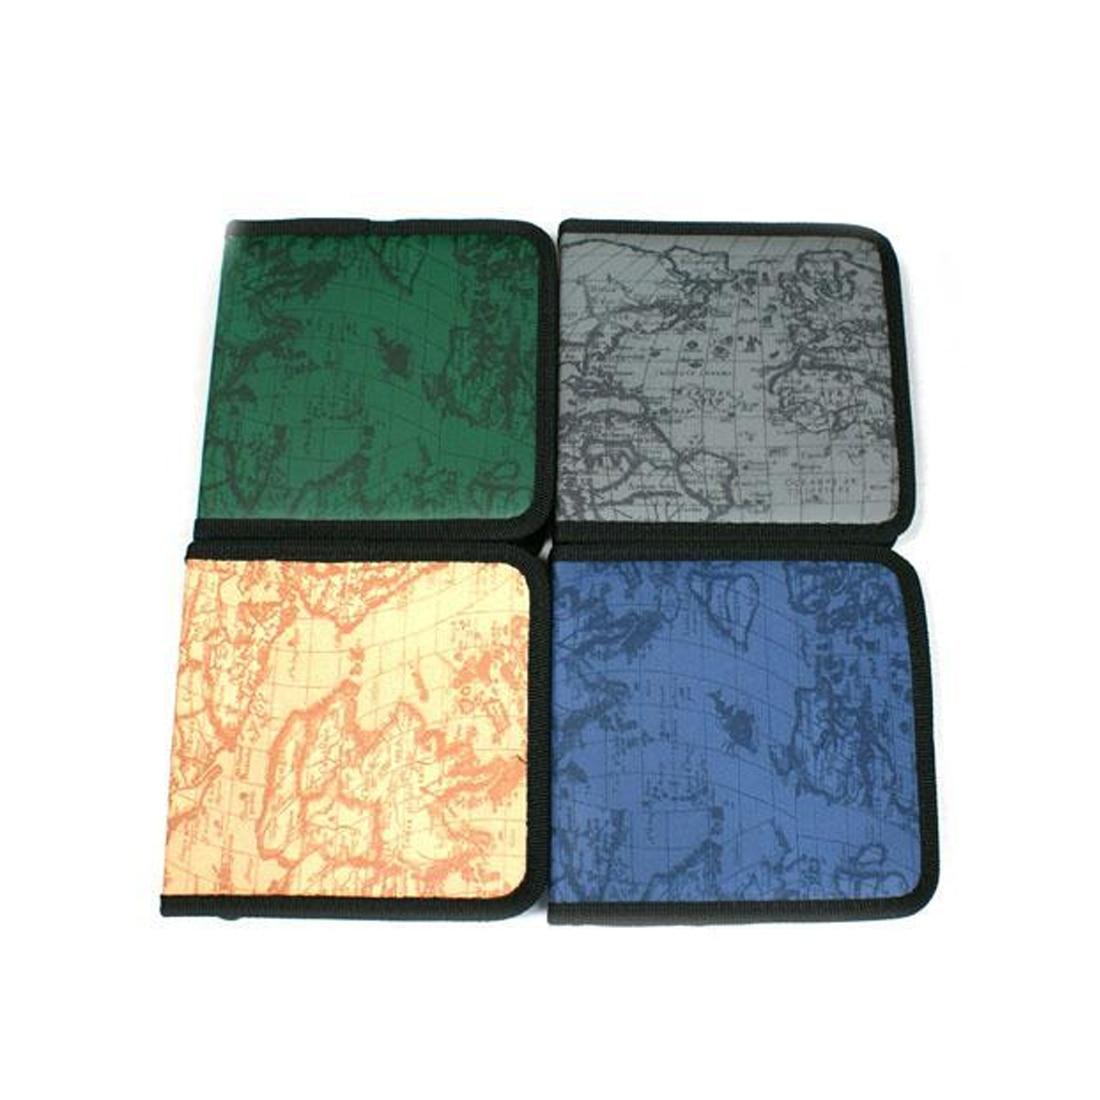 40 CD DVD Disc Storage Holder Carry Case Organizer Sleeve Wallet Cover Bag Box DVD Storage Album CD Box Cases